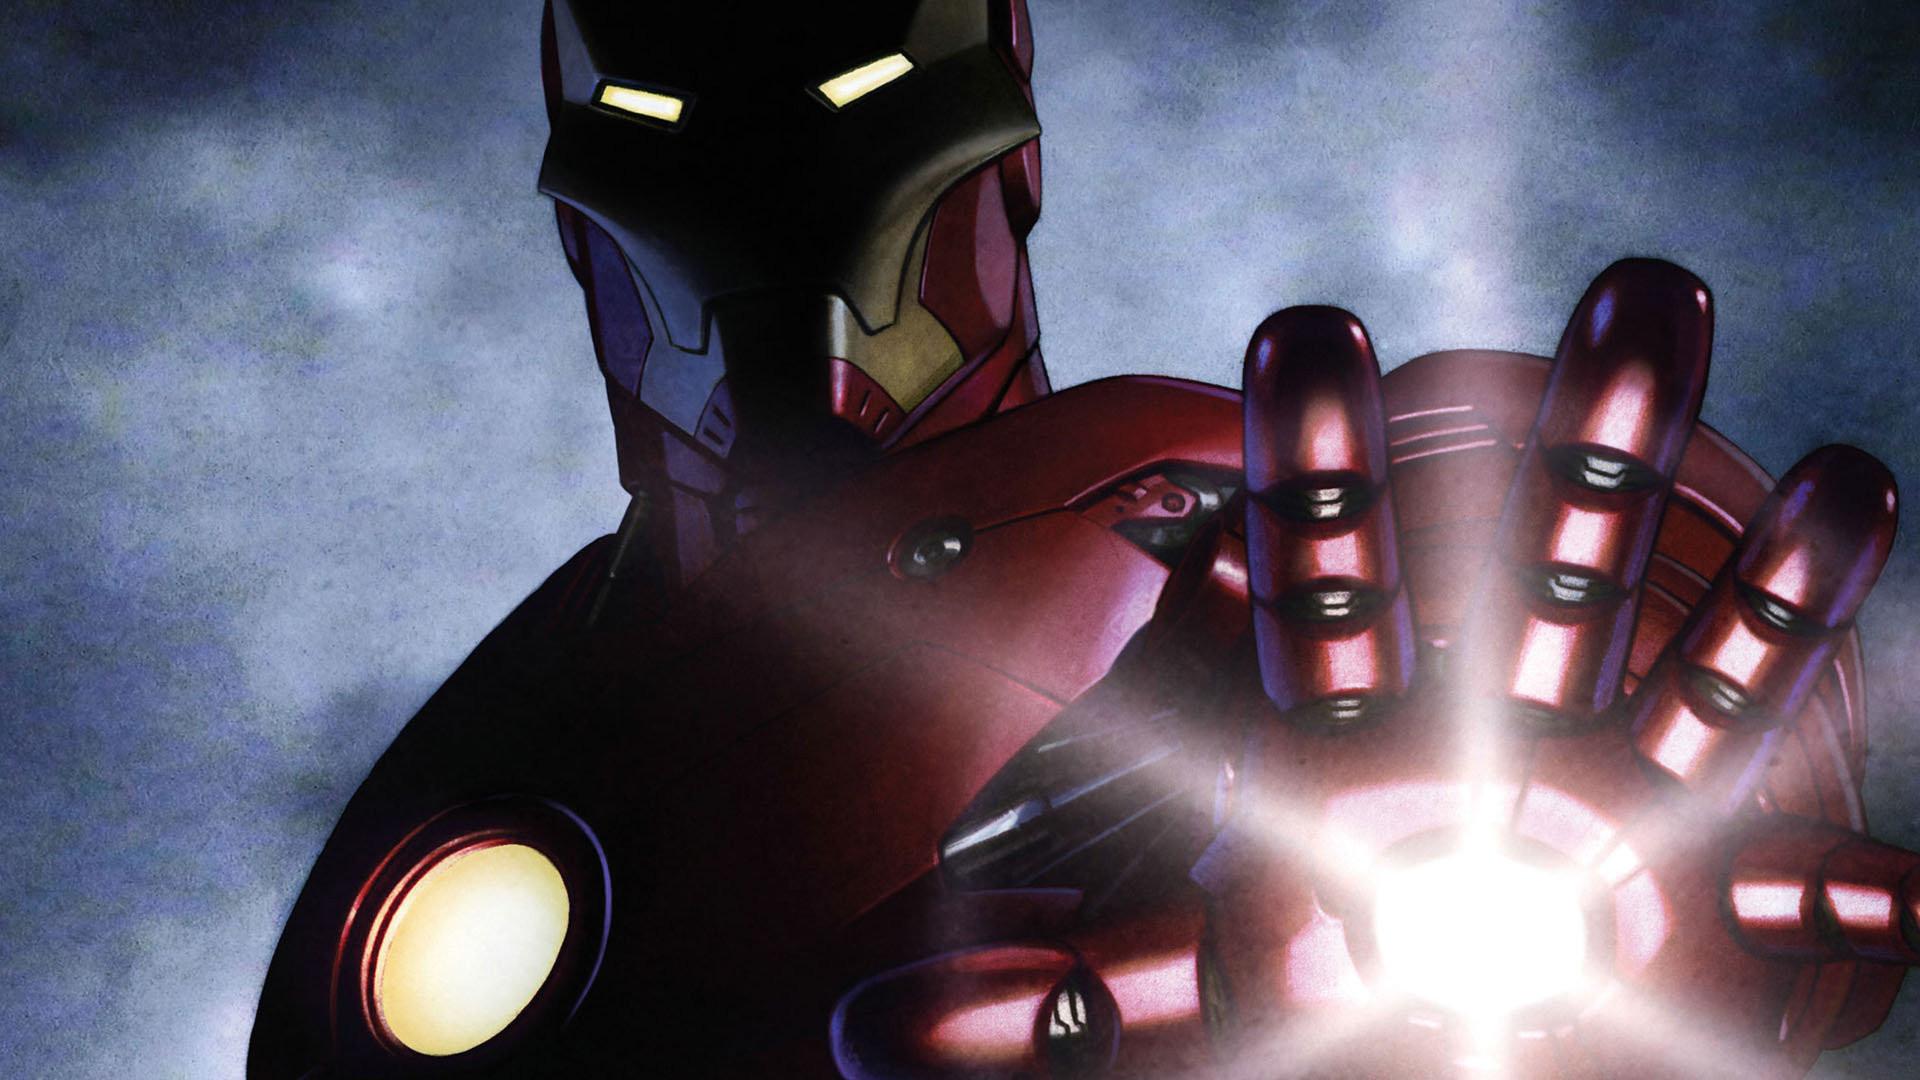 Iron Man Comic Hero Wallpapers HD Wallpapers 1920x1080